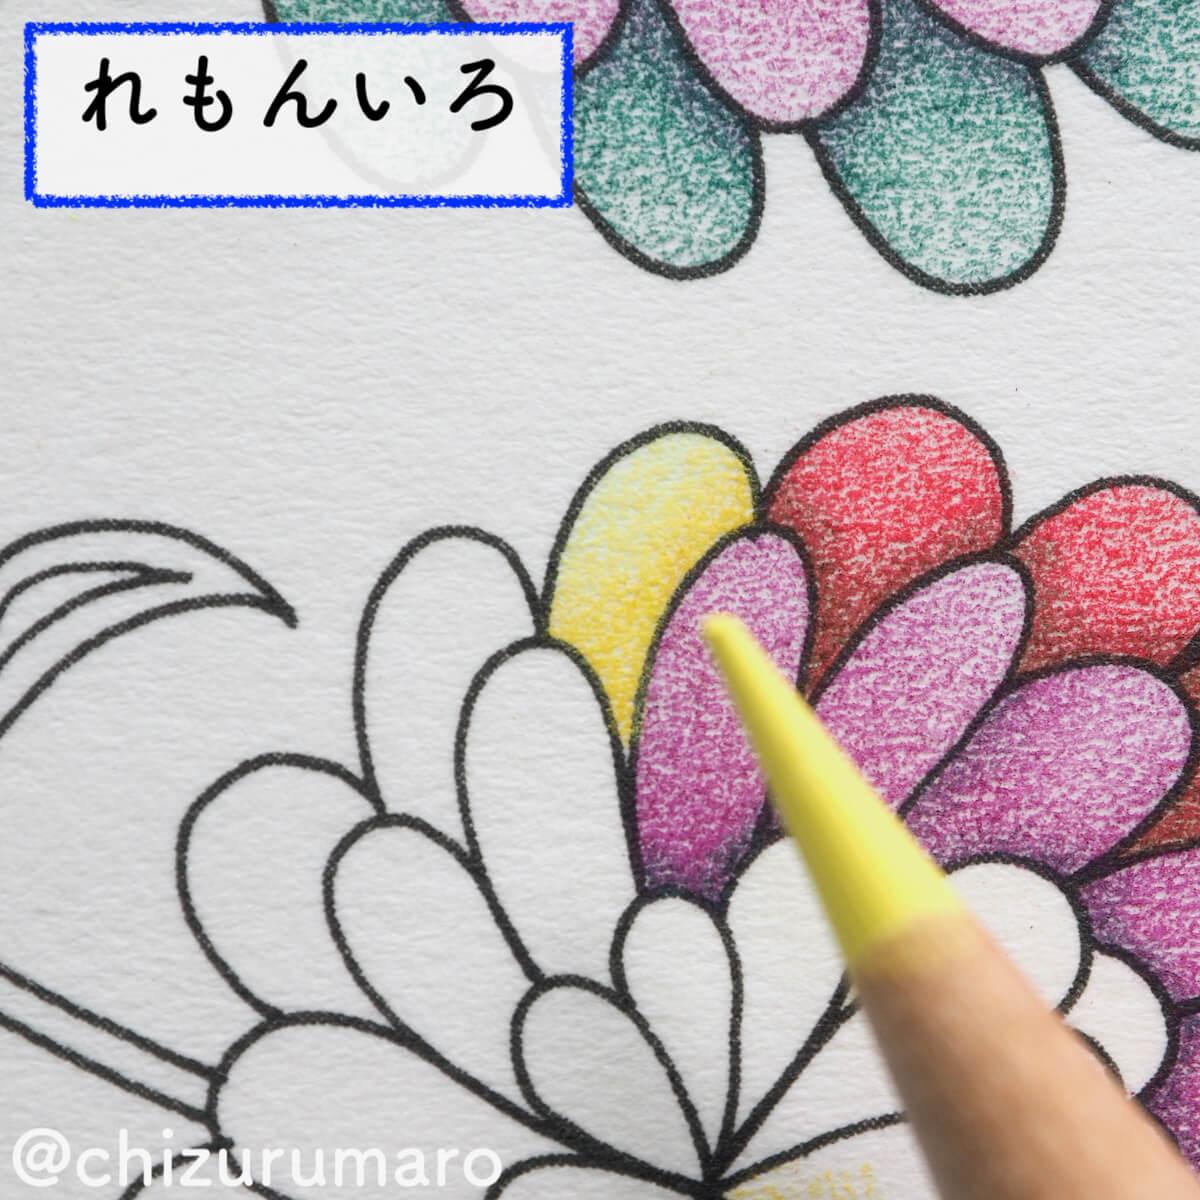 f:id:chizurumaro:20200326115141j:plain